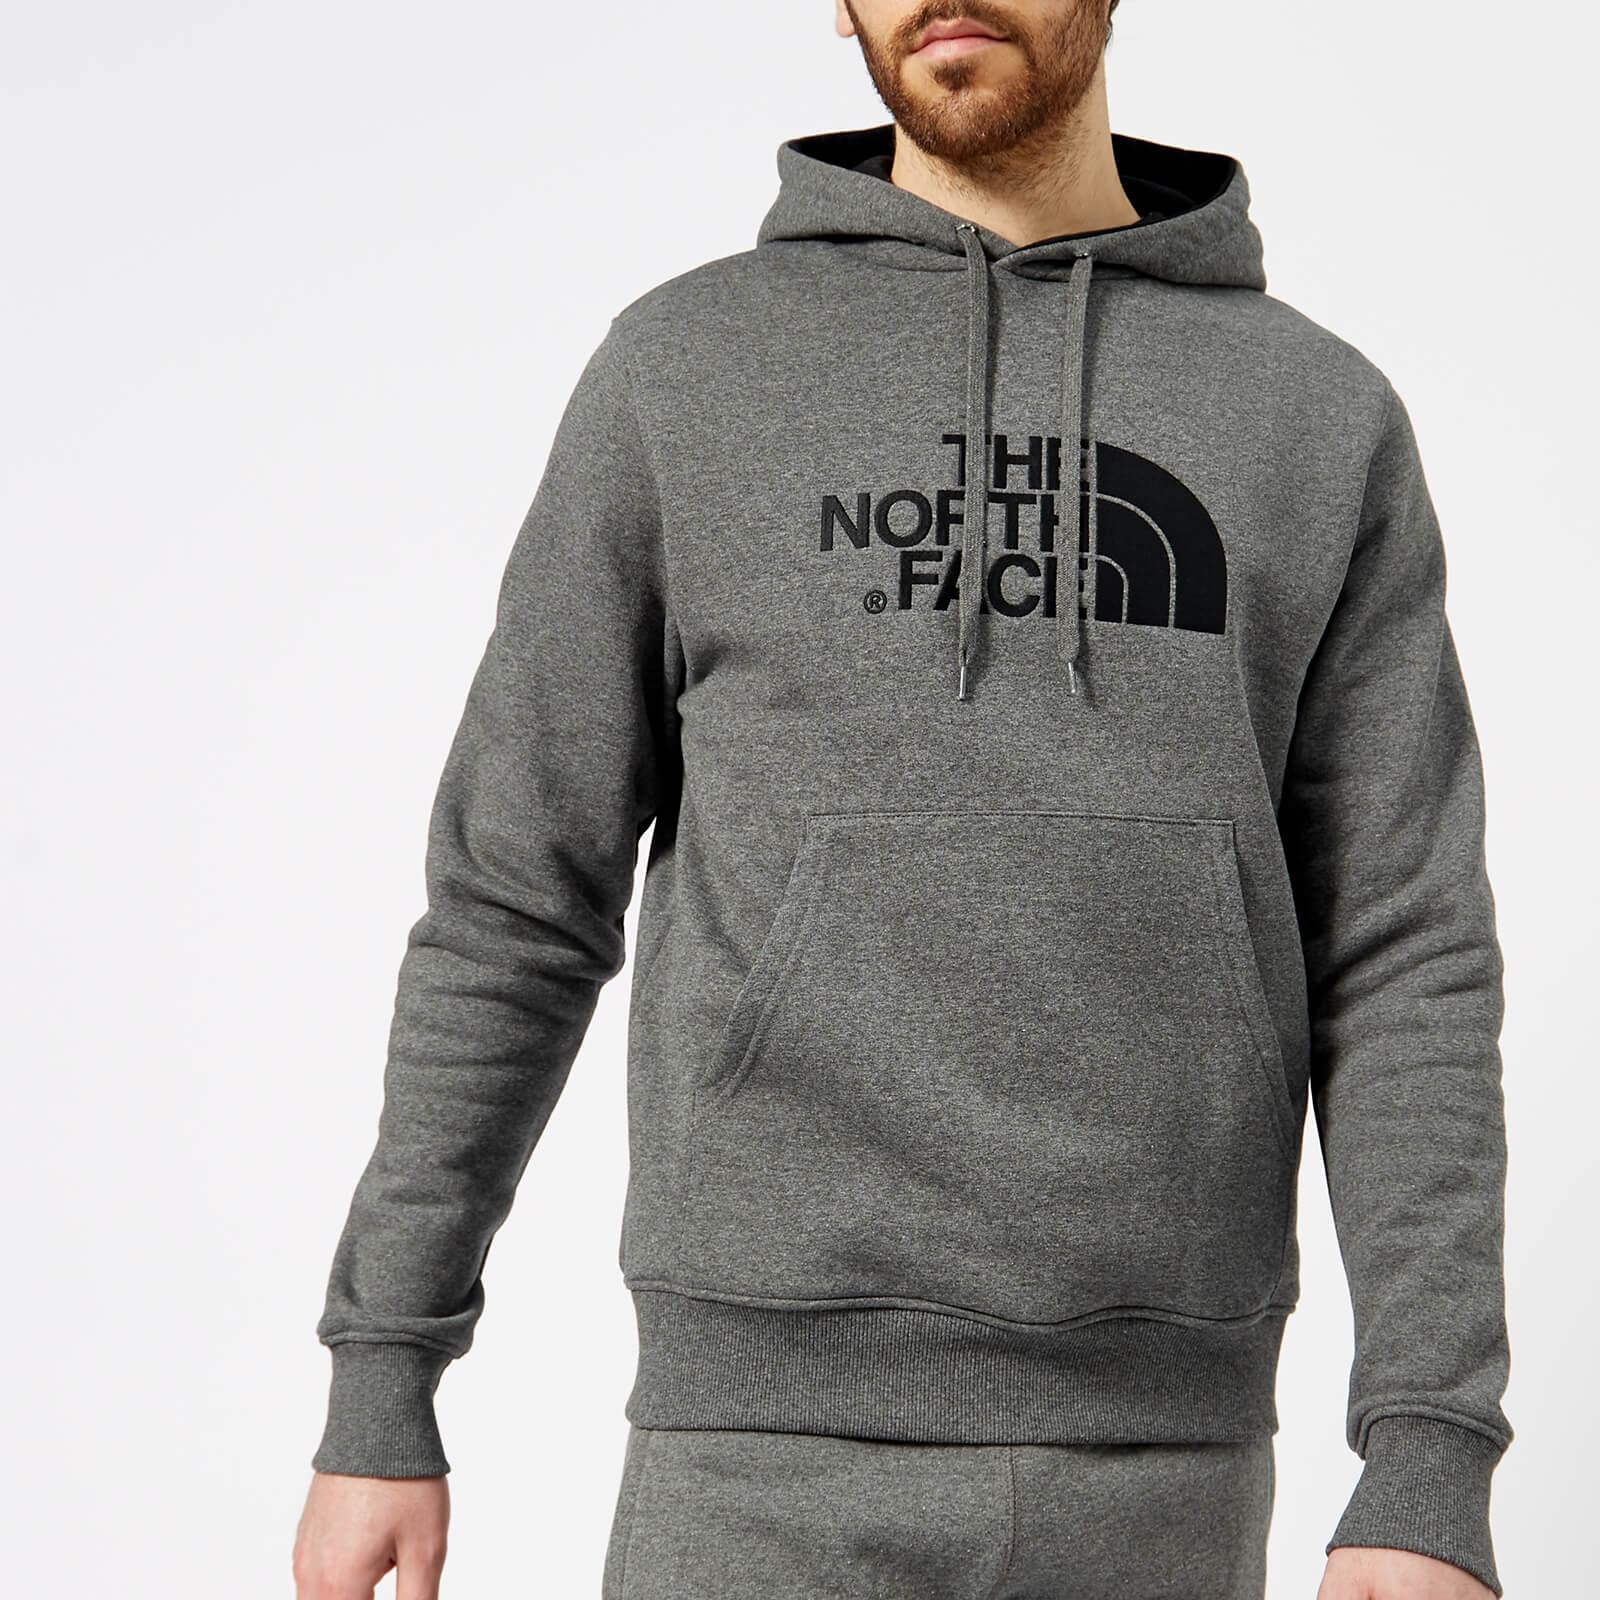 The North Face Men's Drew Peak Pullover Hoody - TNF Medium Grey Heather - S